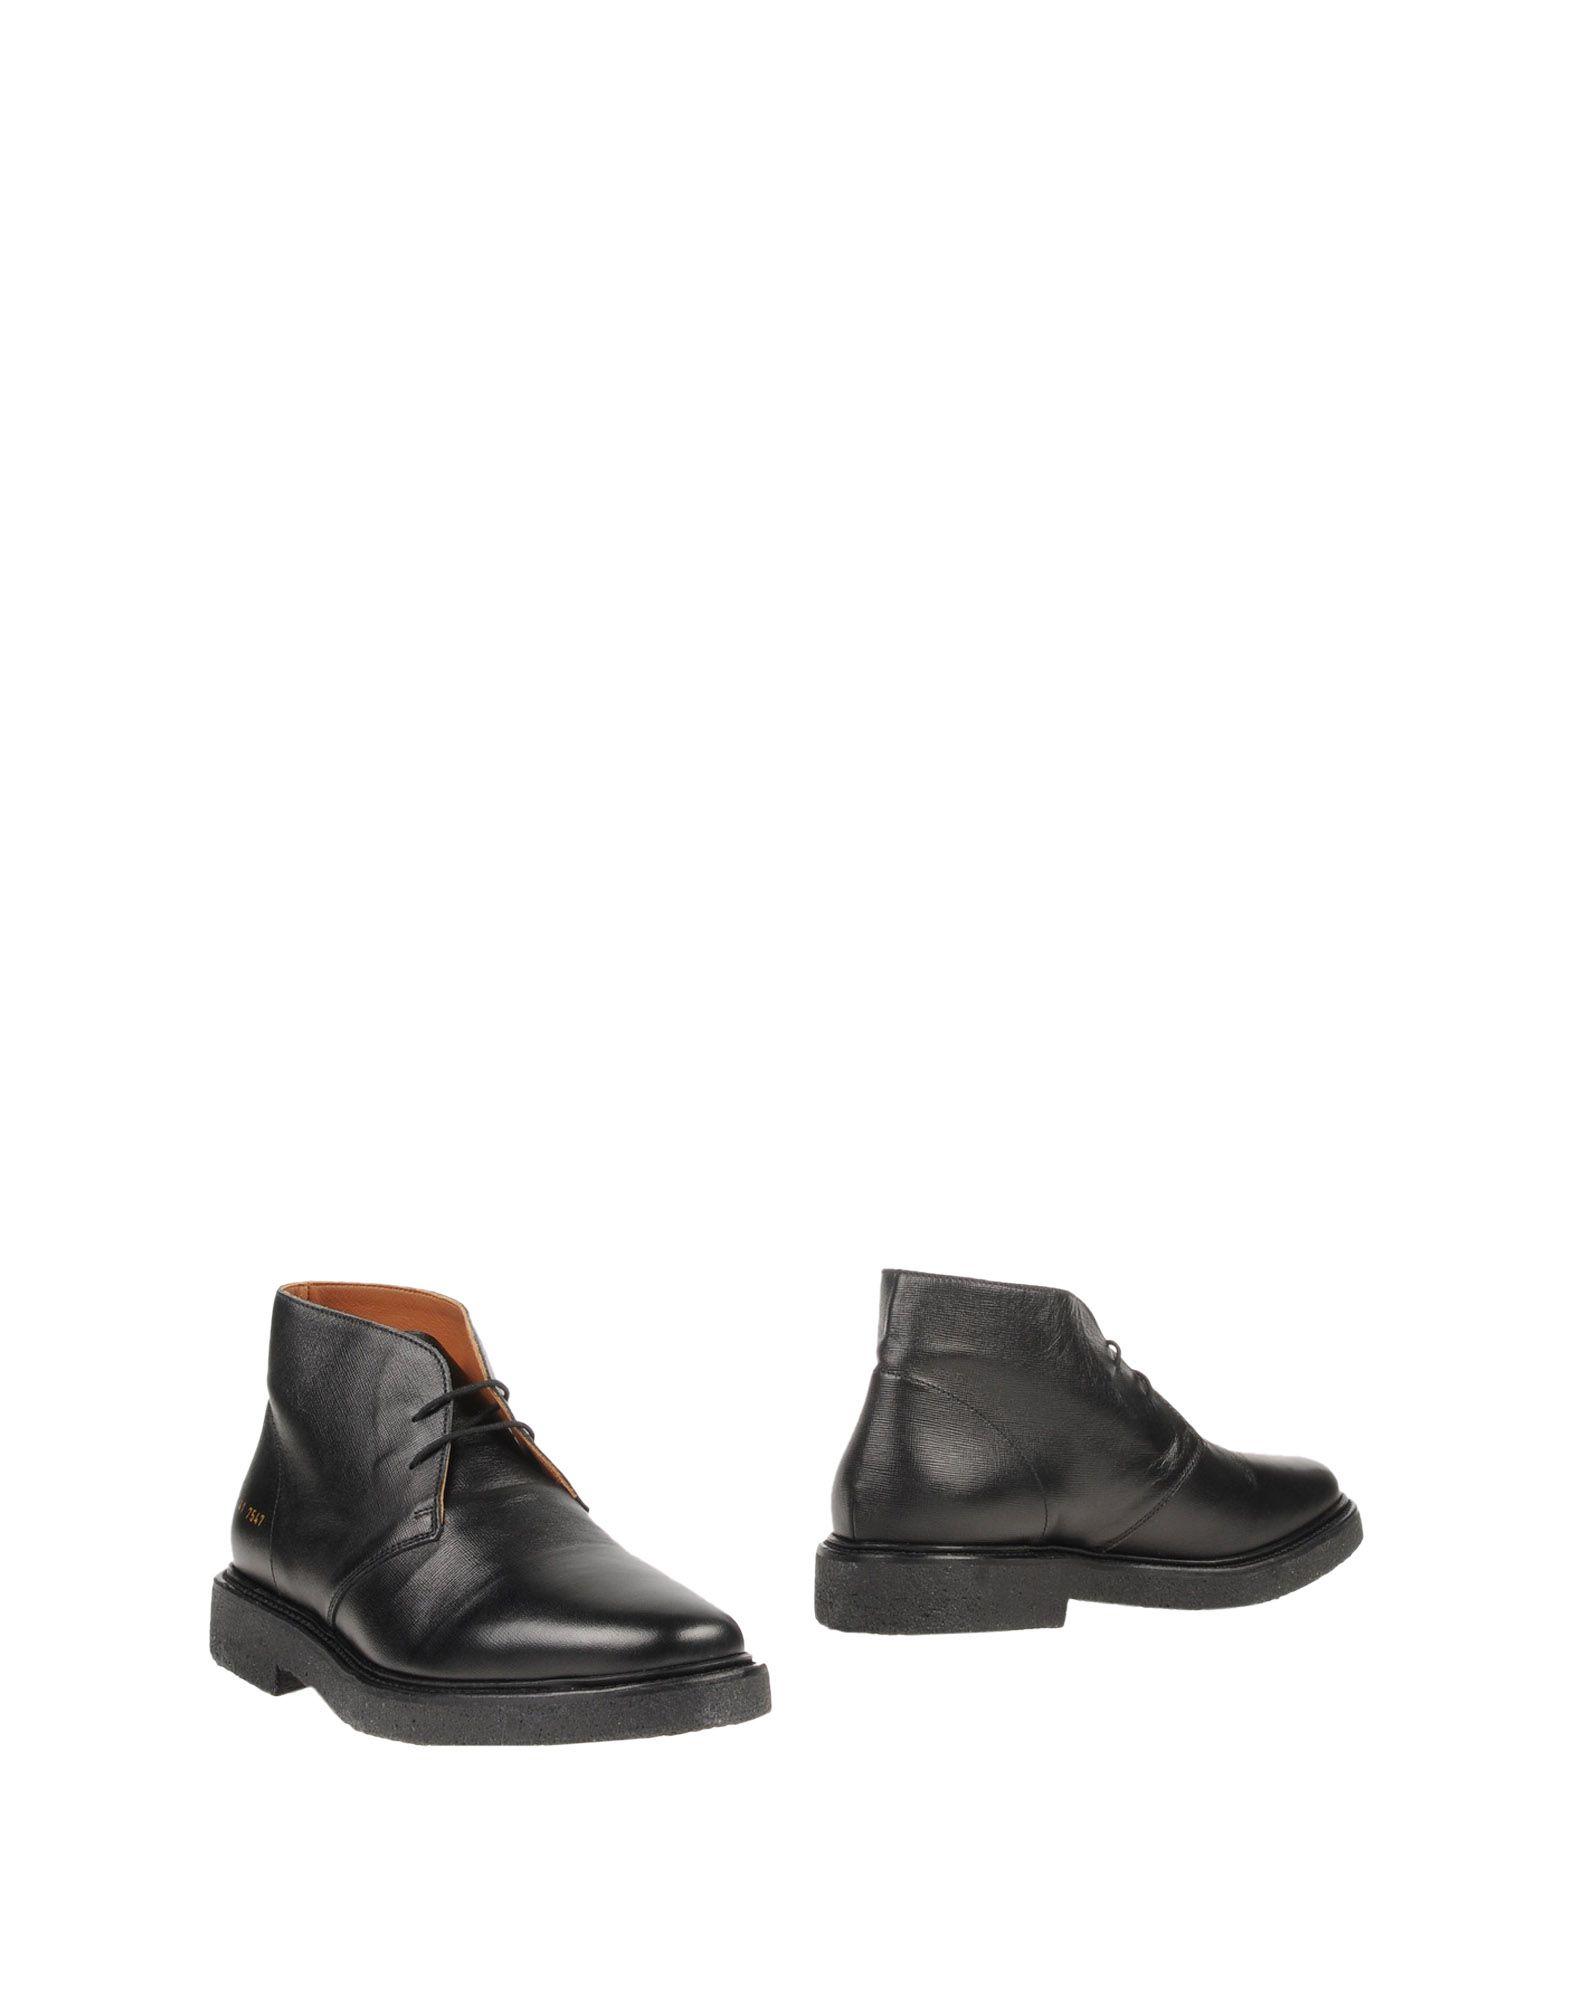 woman by common projects полусапоги и высокие ботинки COMMON PROJECTS Полусапоги и высокие ботинки